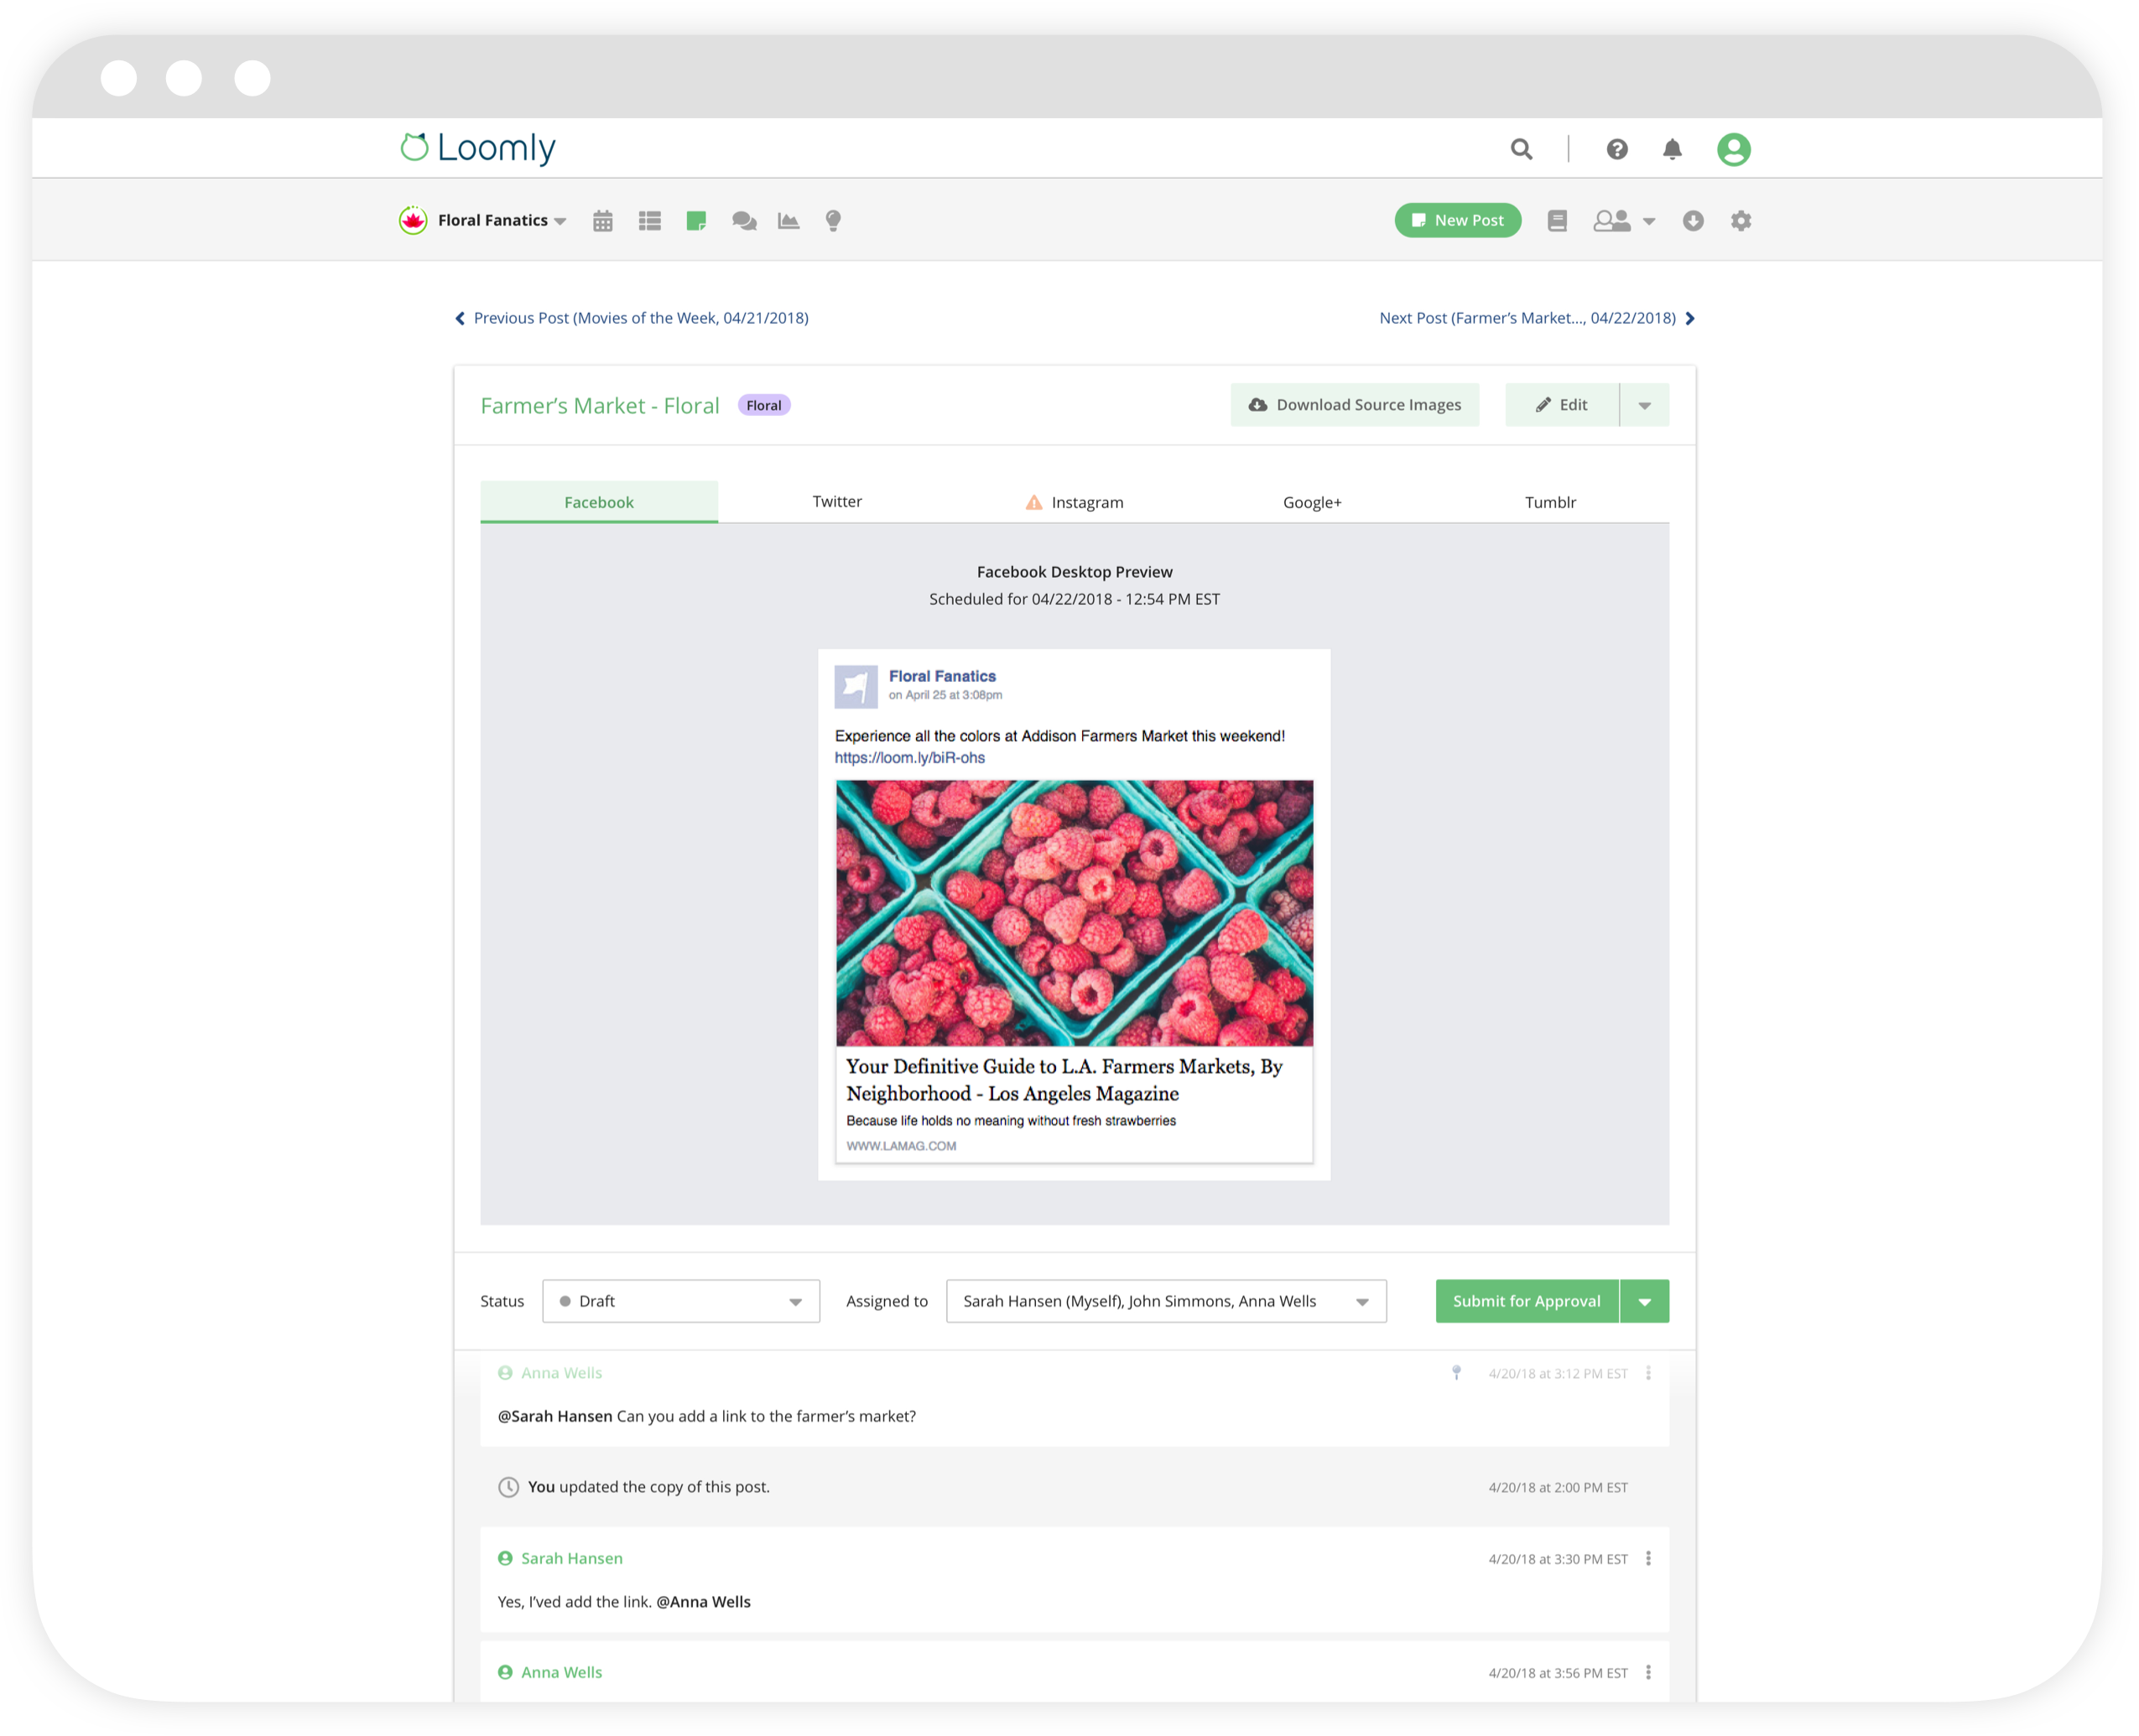 Loomly Software - Loomly New Post